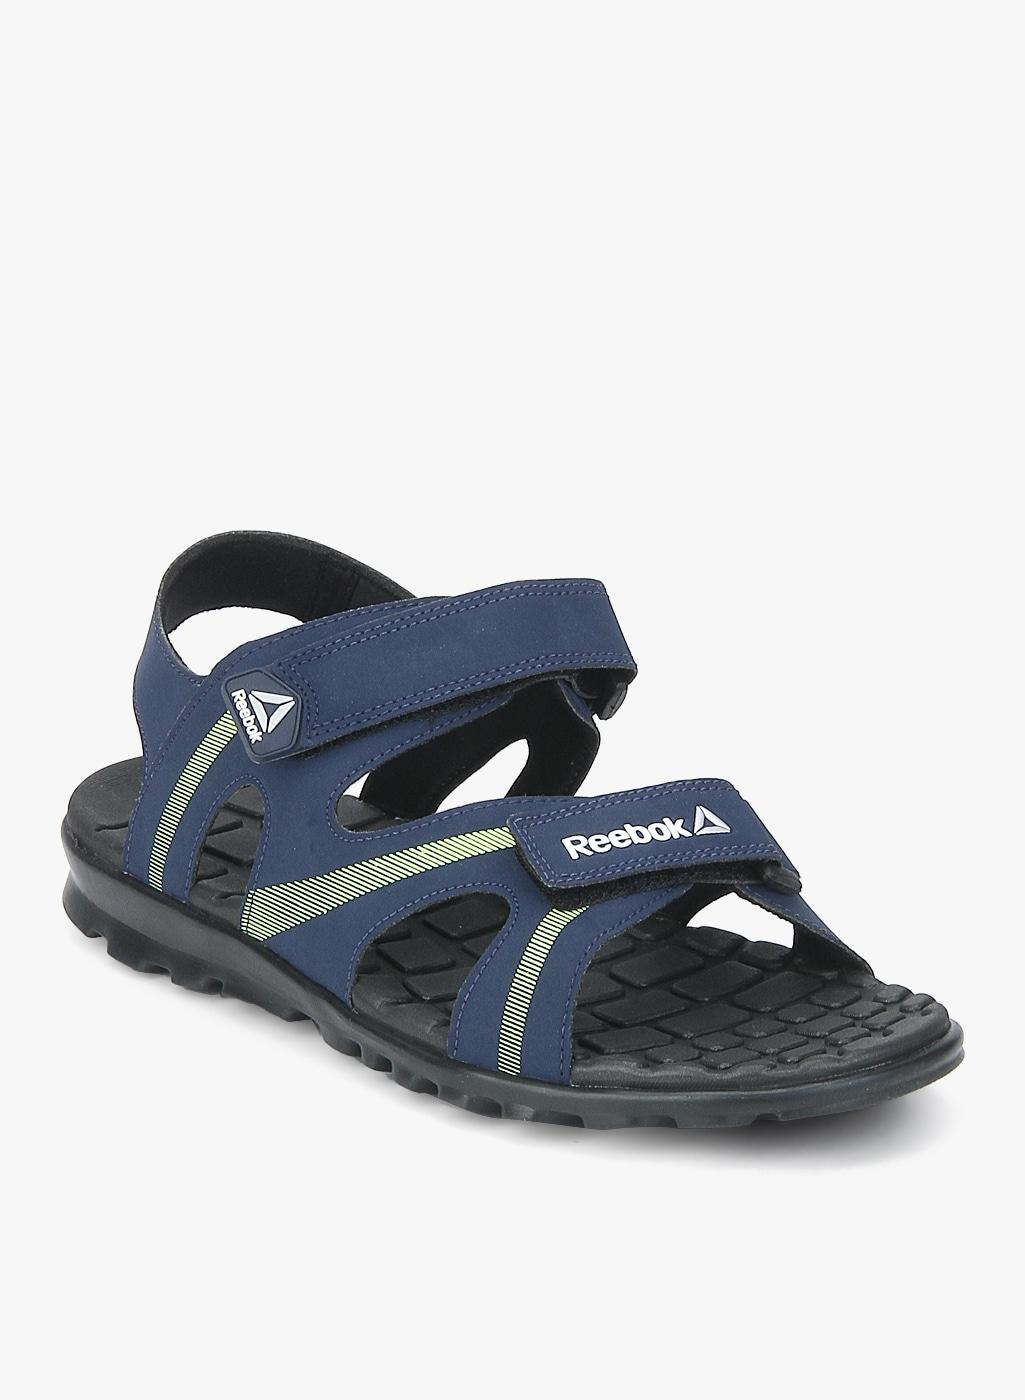 f029757d811 Reebok Swimwear Sports Sandals - Buy Reebok Swimwear Sports Sandals online  in India